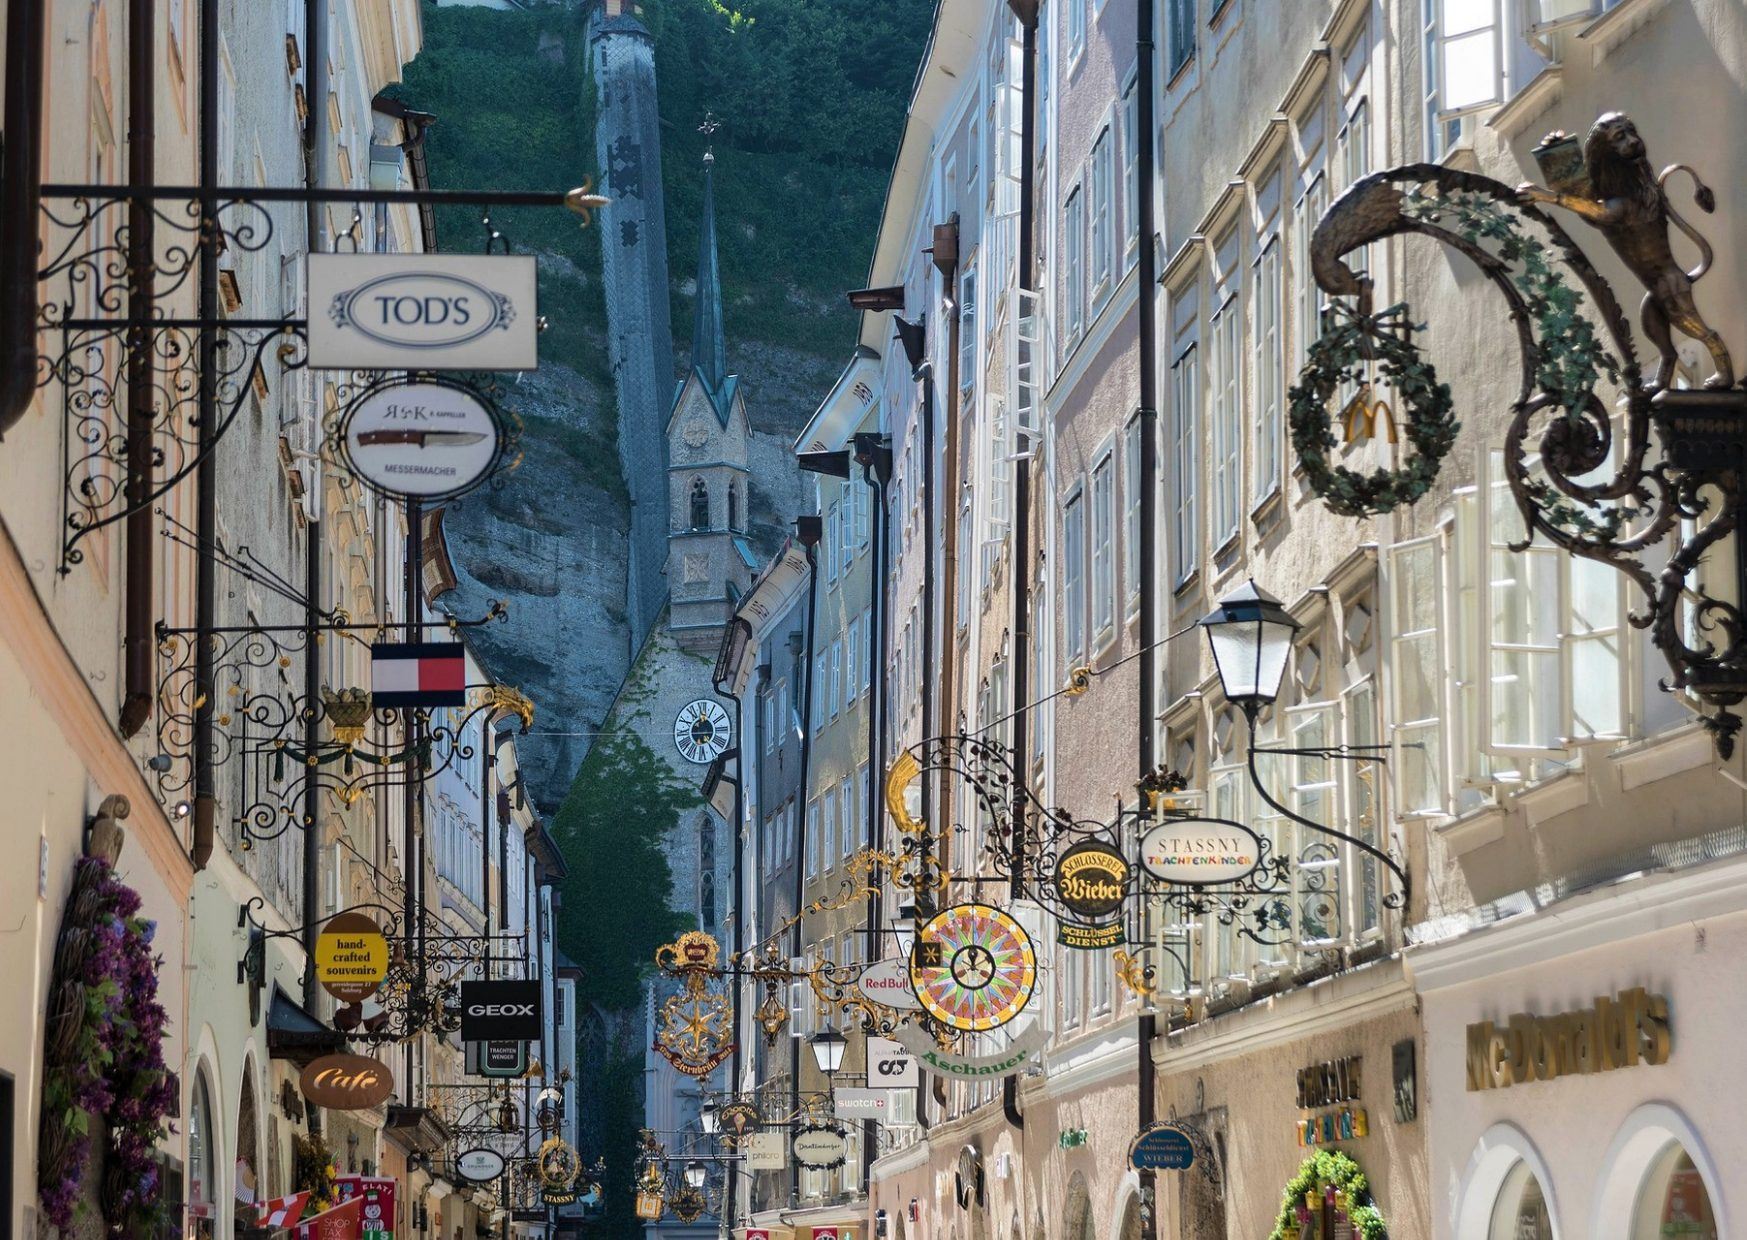 Salzburg Old Town – Getreidegasse - photo by Voices of Travel